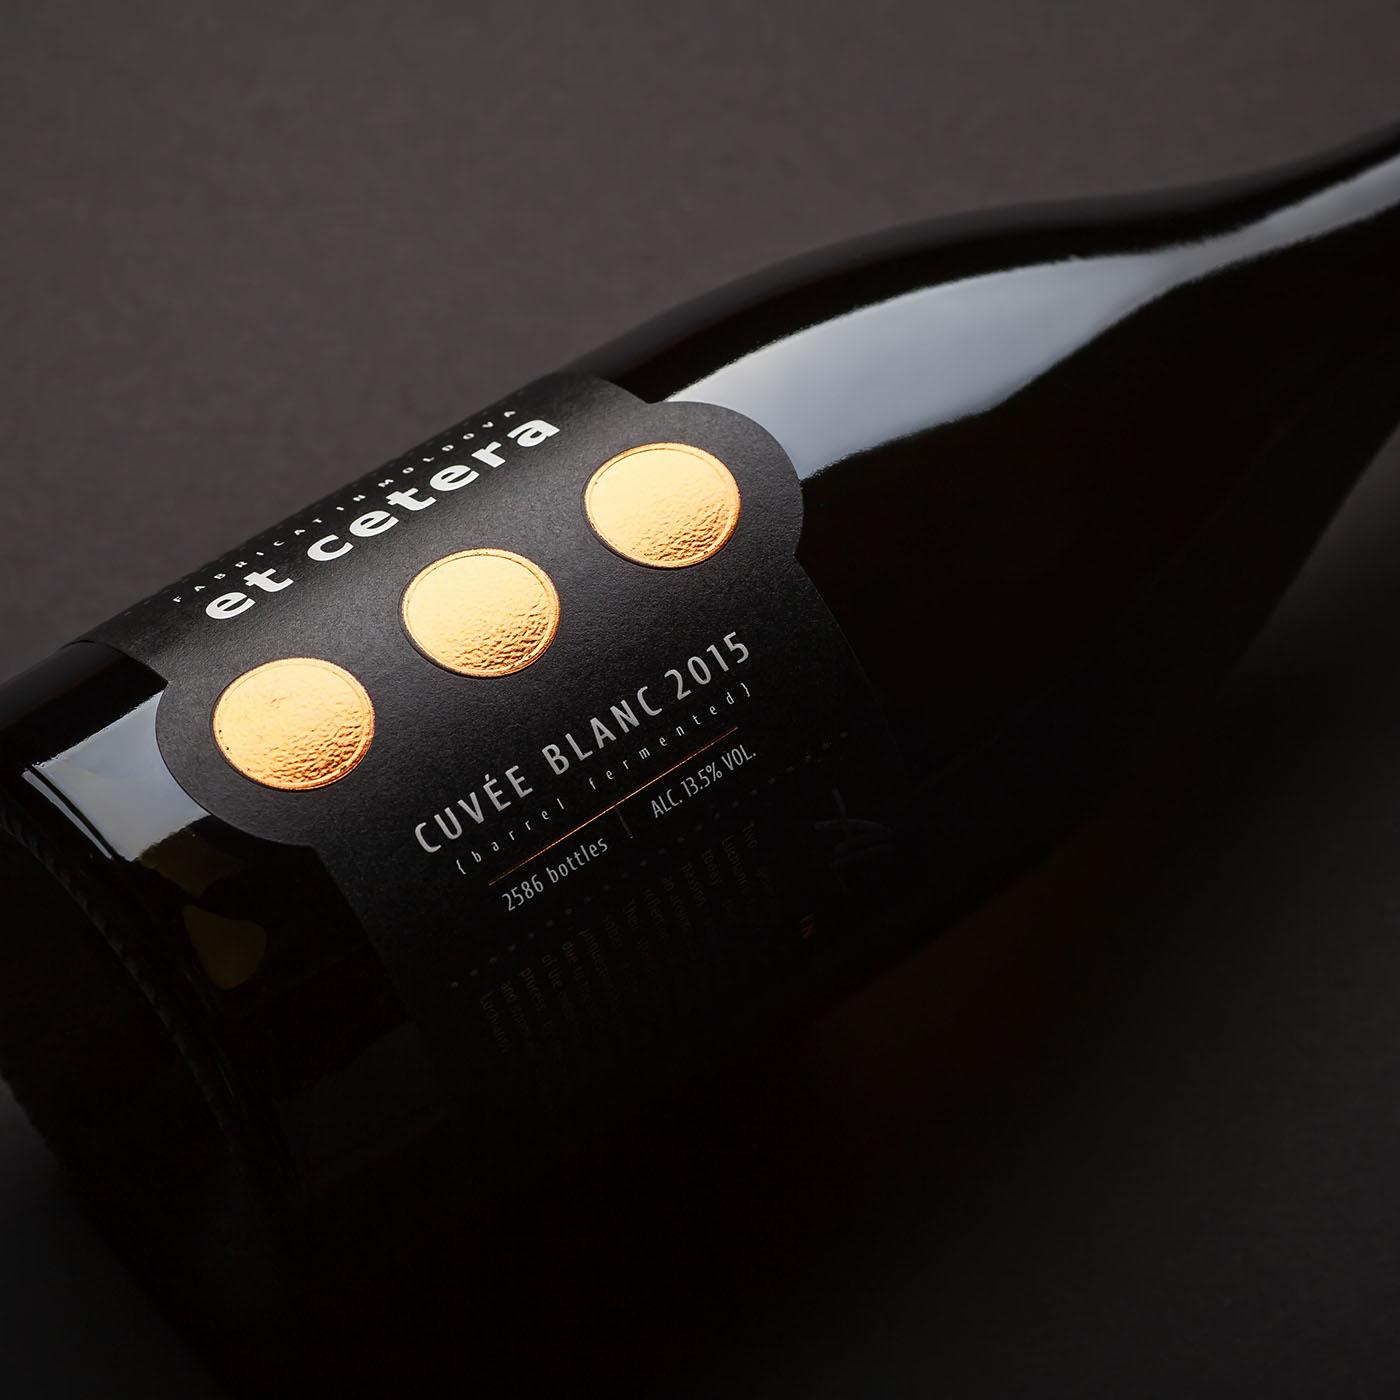 valerii sumilov shumilovedesign Packaging et cetera wine label packaging design Photography  artistic